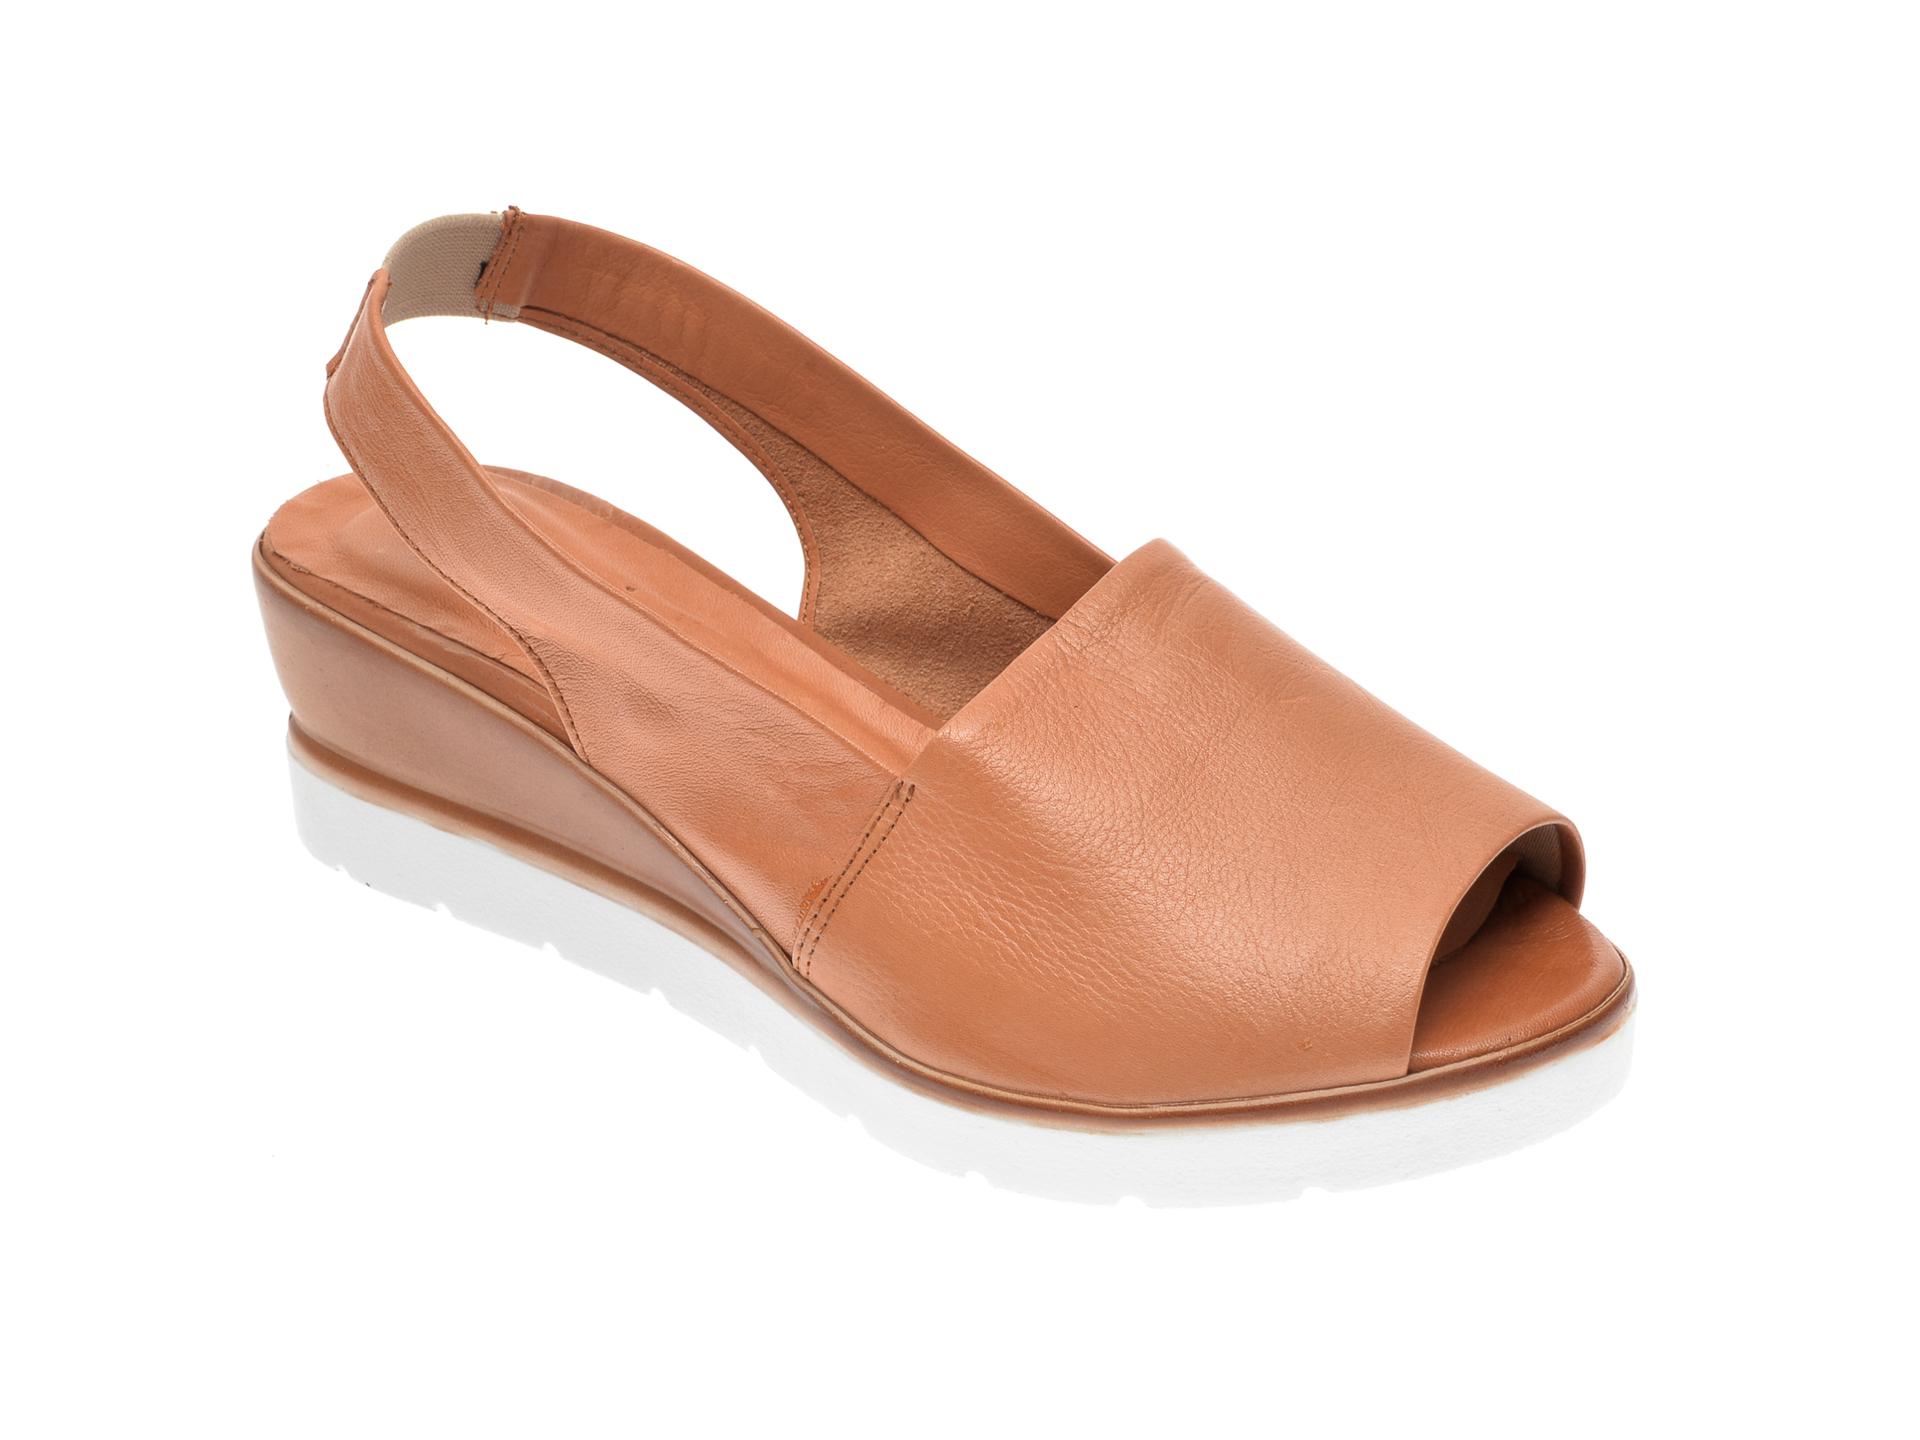 Sandale FLAVIA PASSINI maro, 2103, din piele naturala